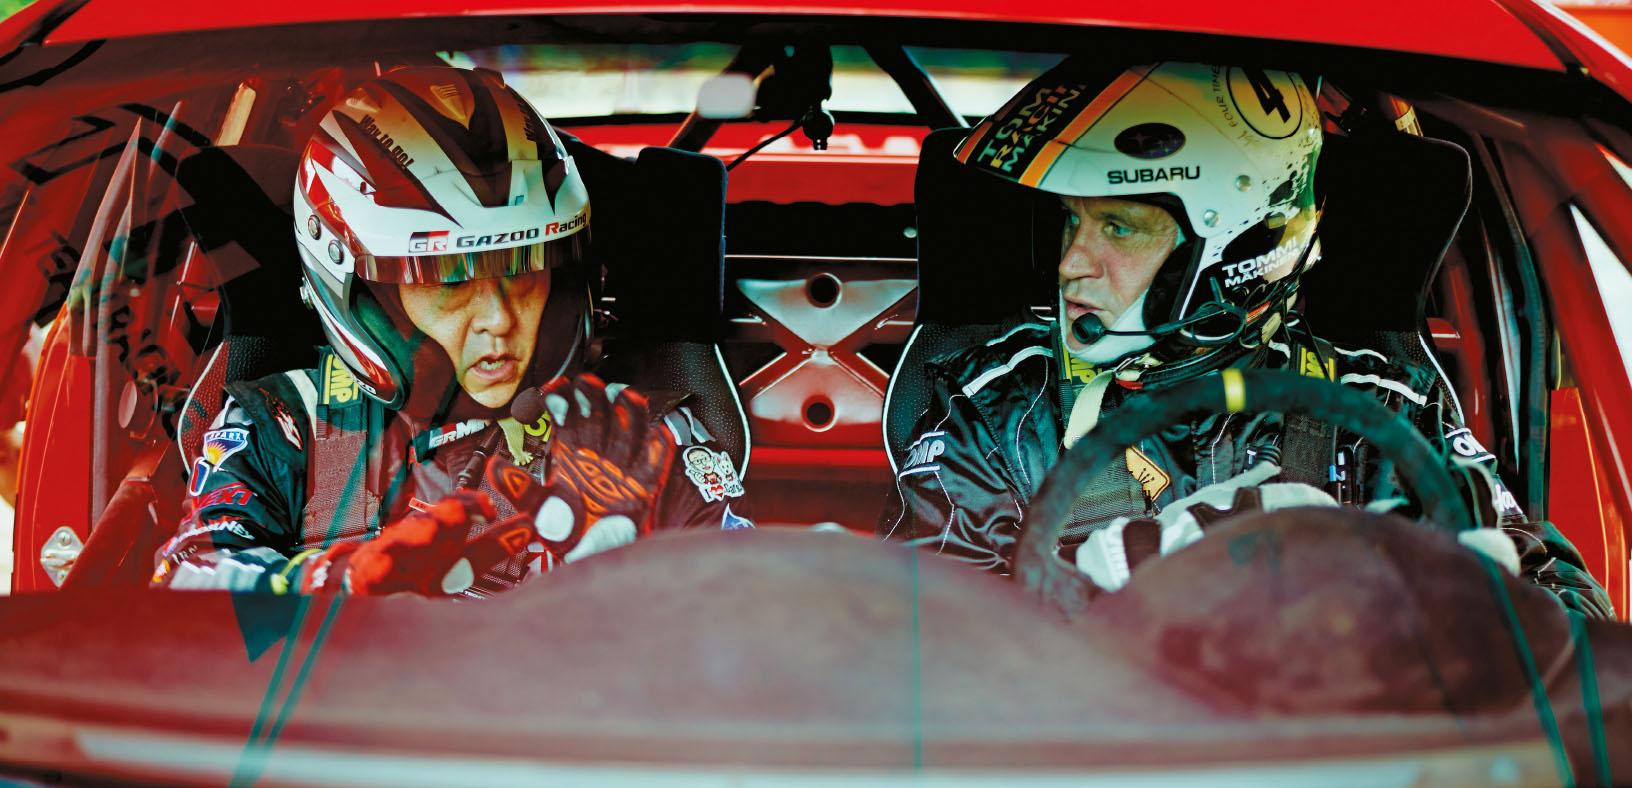 Tutoring Toyota boss Akio Toyoda, who has also entrusted Mäkinen to run his WRC team for the past three seasons